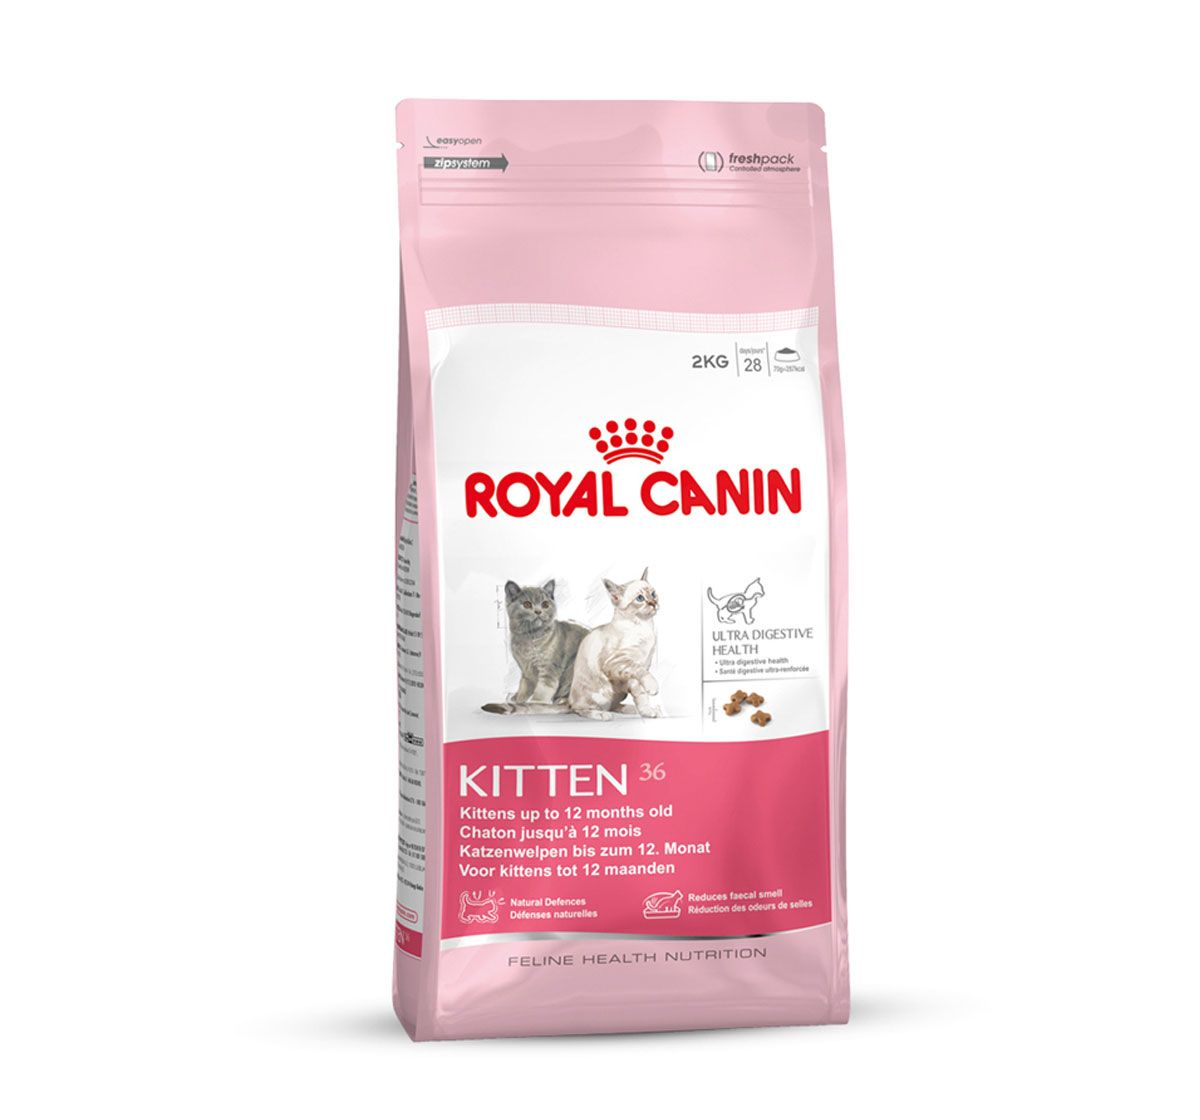 Royal Canin Kitten 400 Gms Royal Canin Dog Food Cat Food Royal Canin